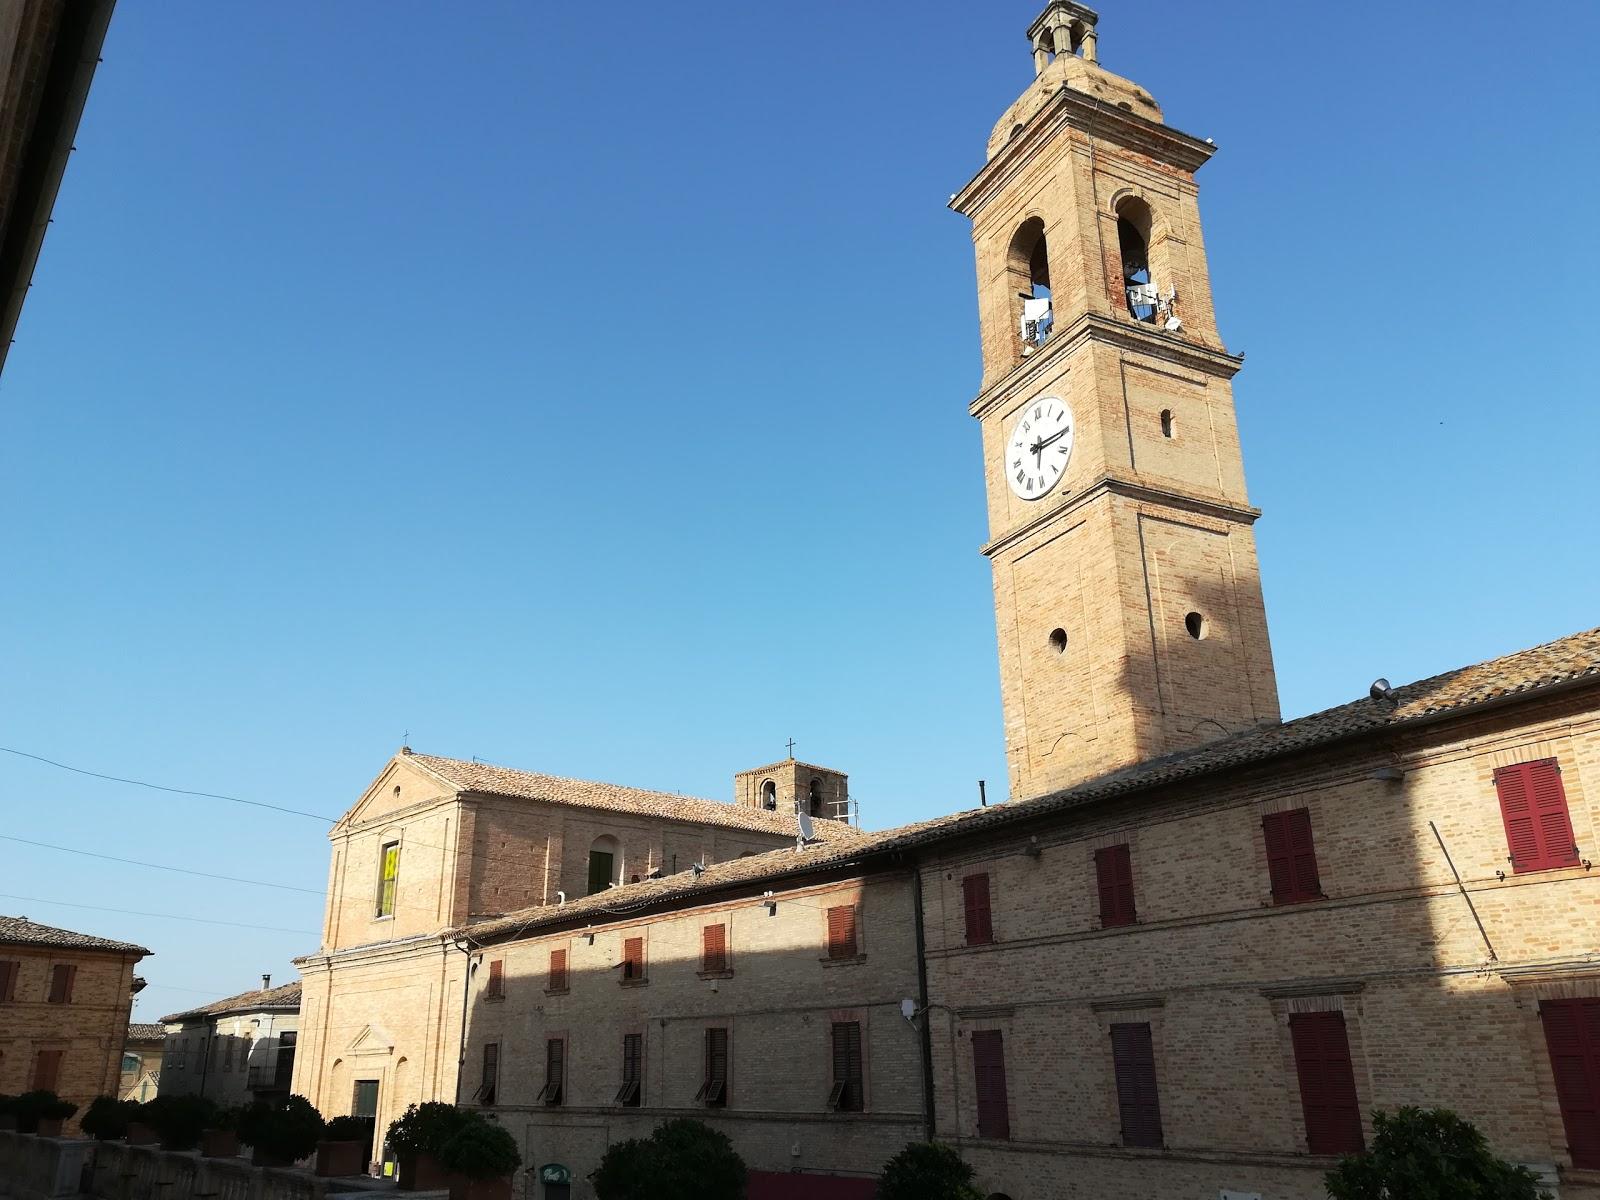 Montecosaro